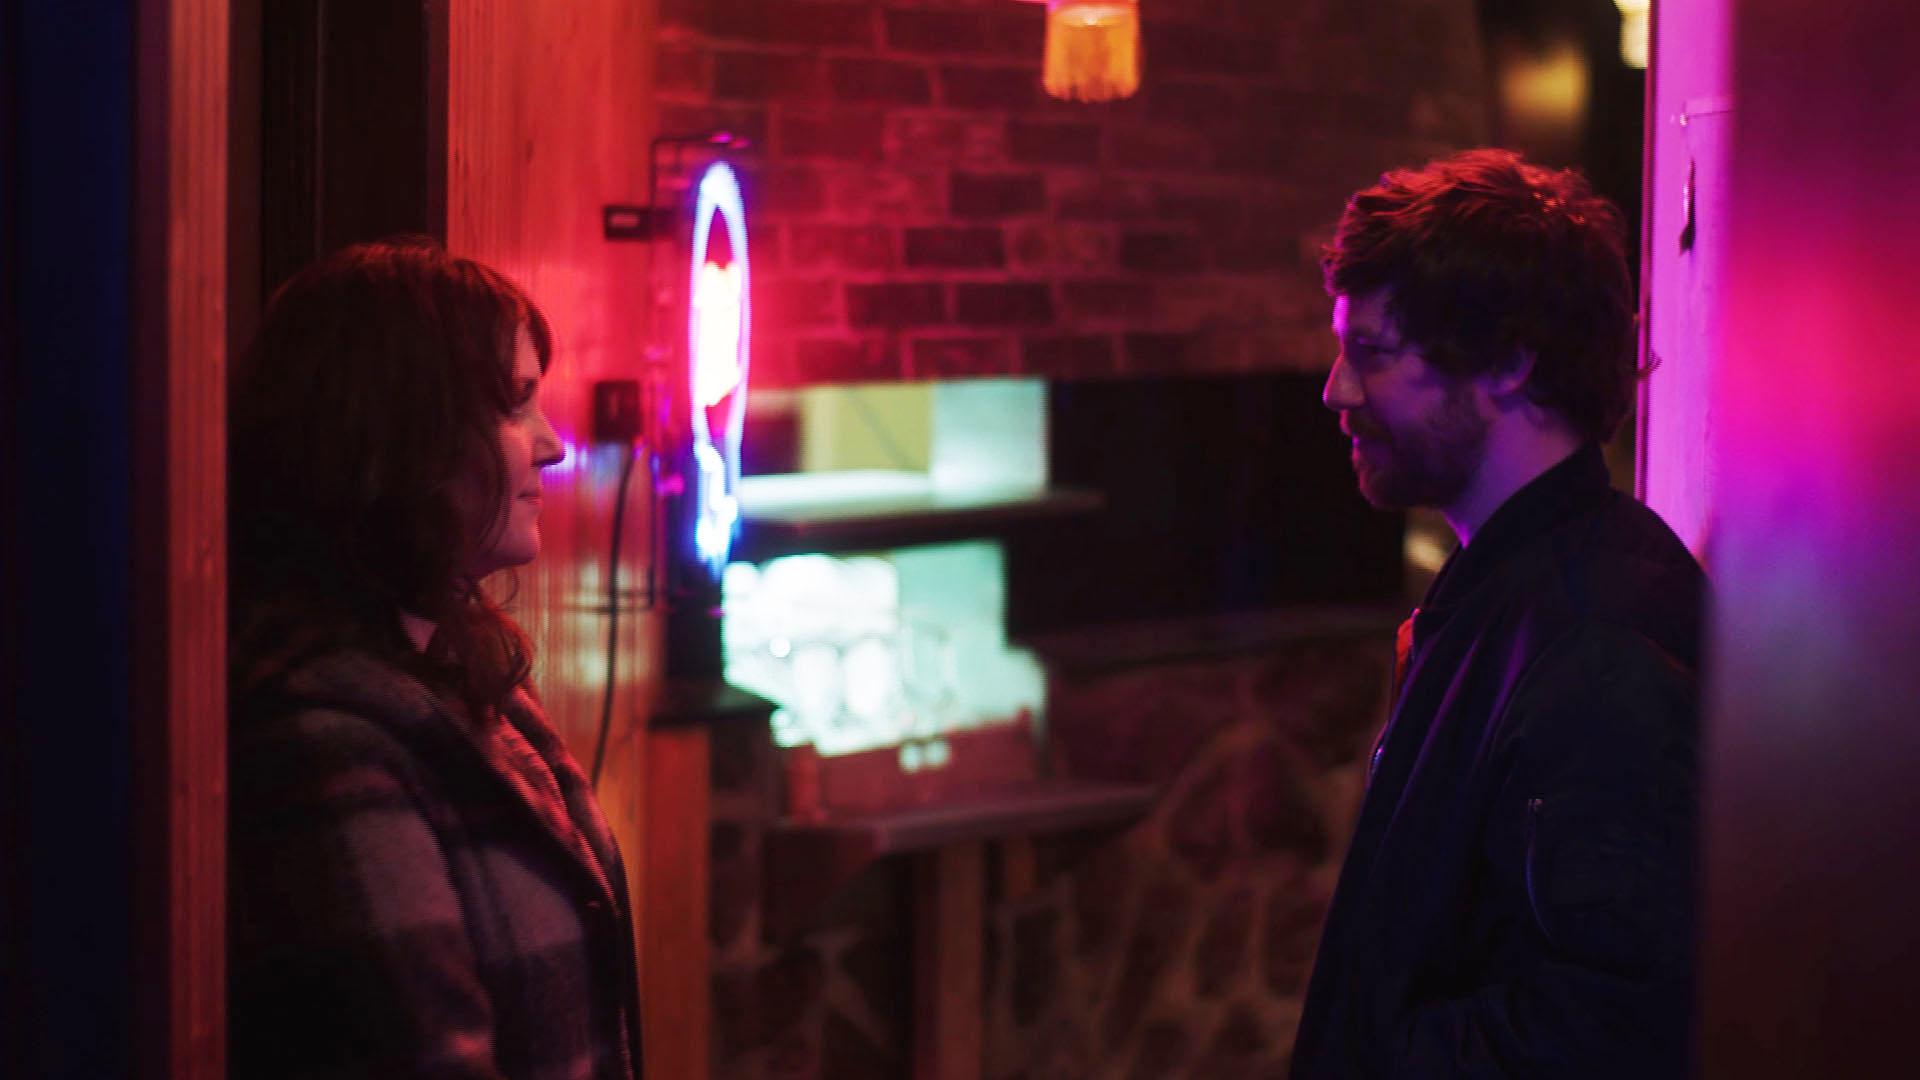 Melanie Lynskey as 'Rae' and John Gallagher, Jr. as 'Cyrus' in SADIE